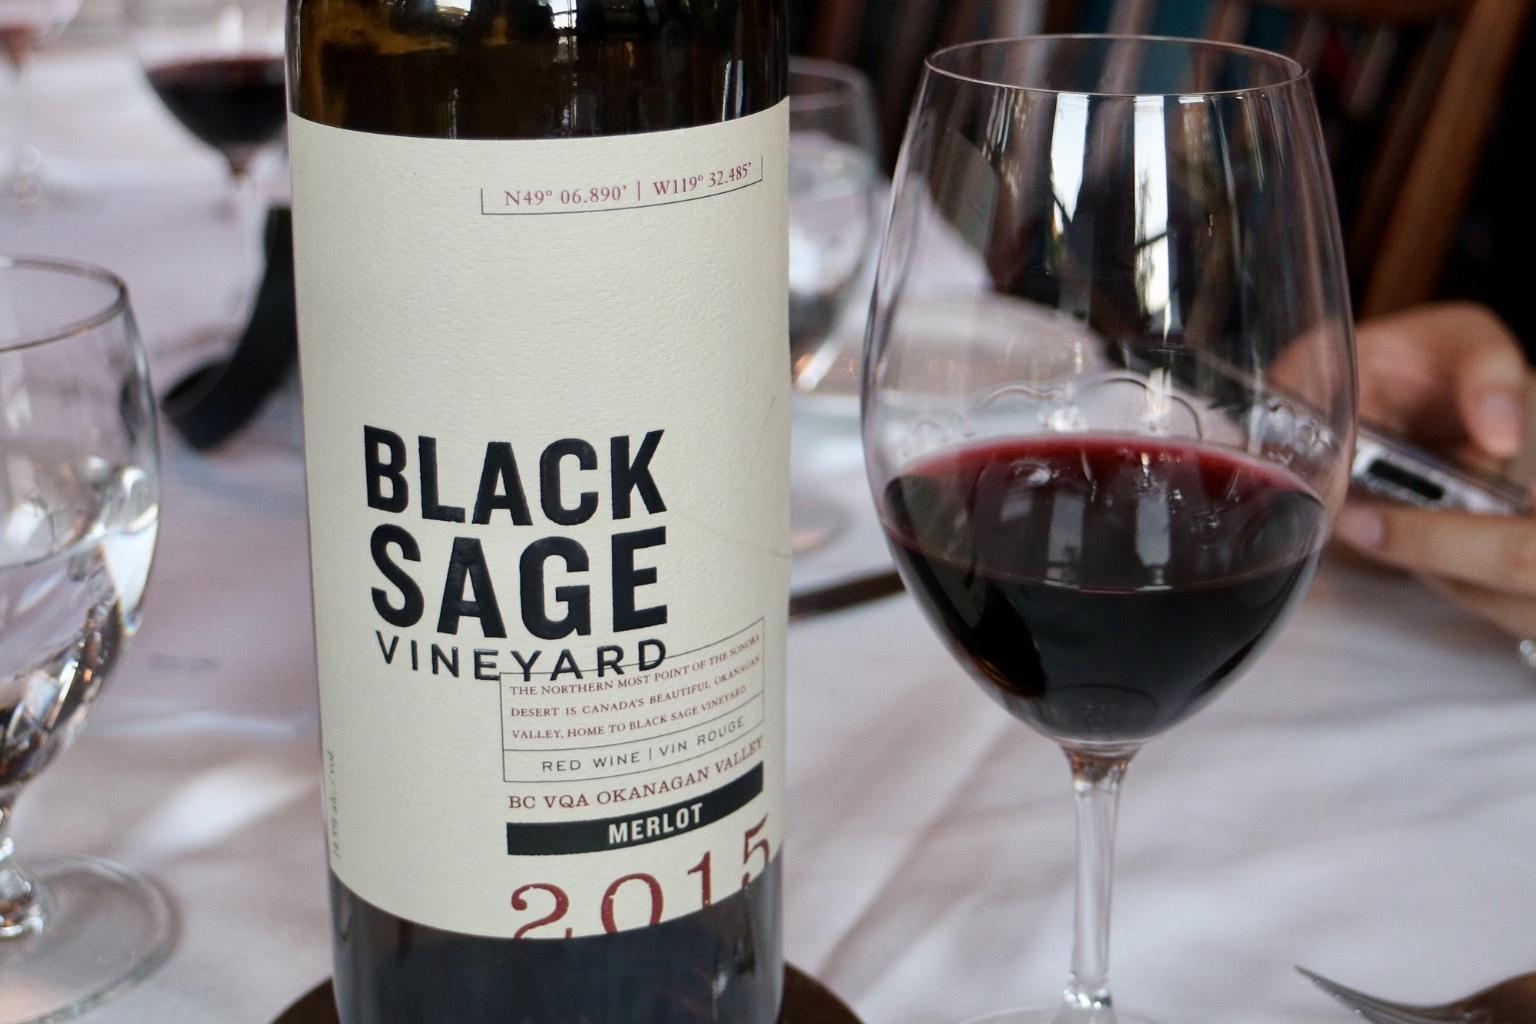 Black Sage Merlot